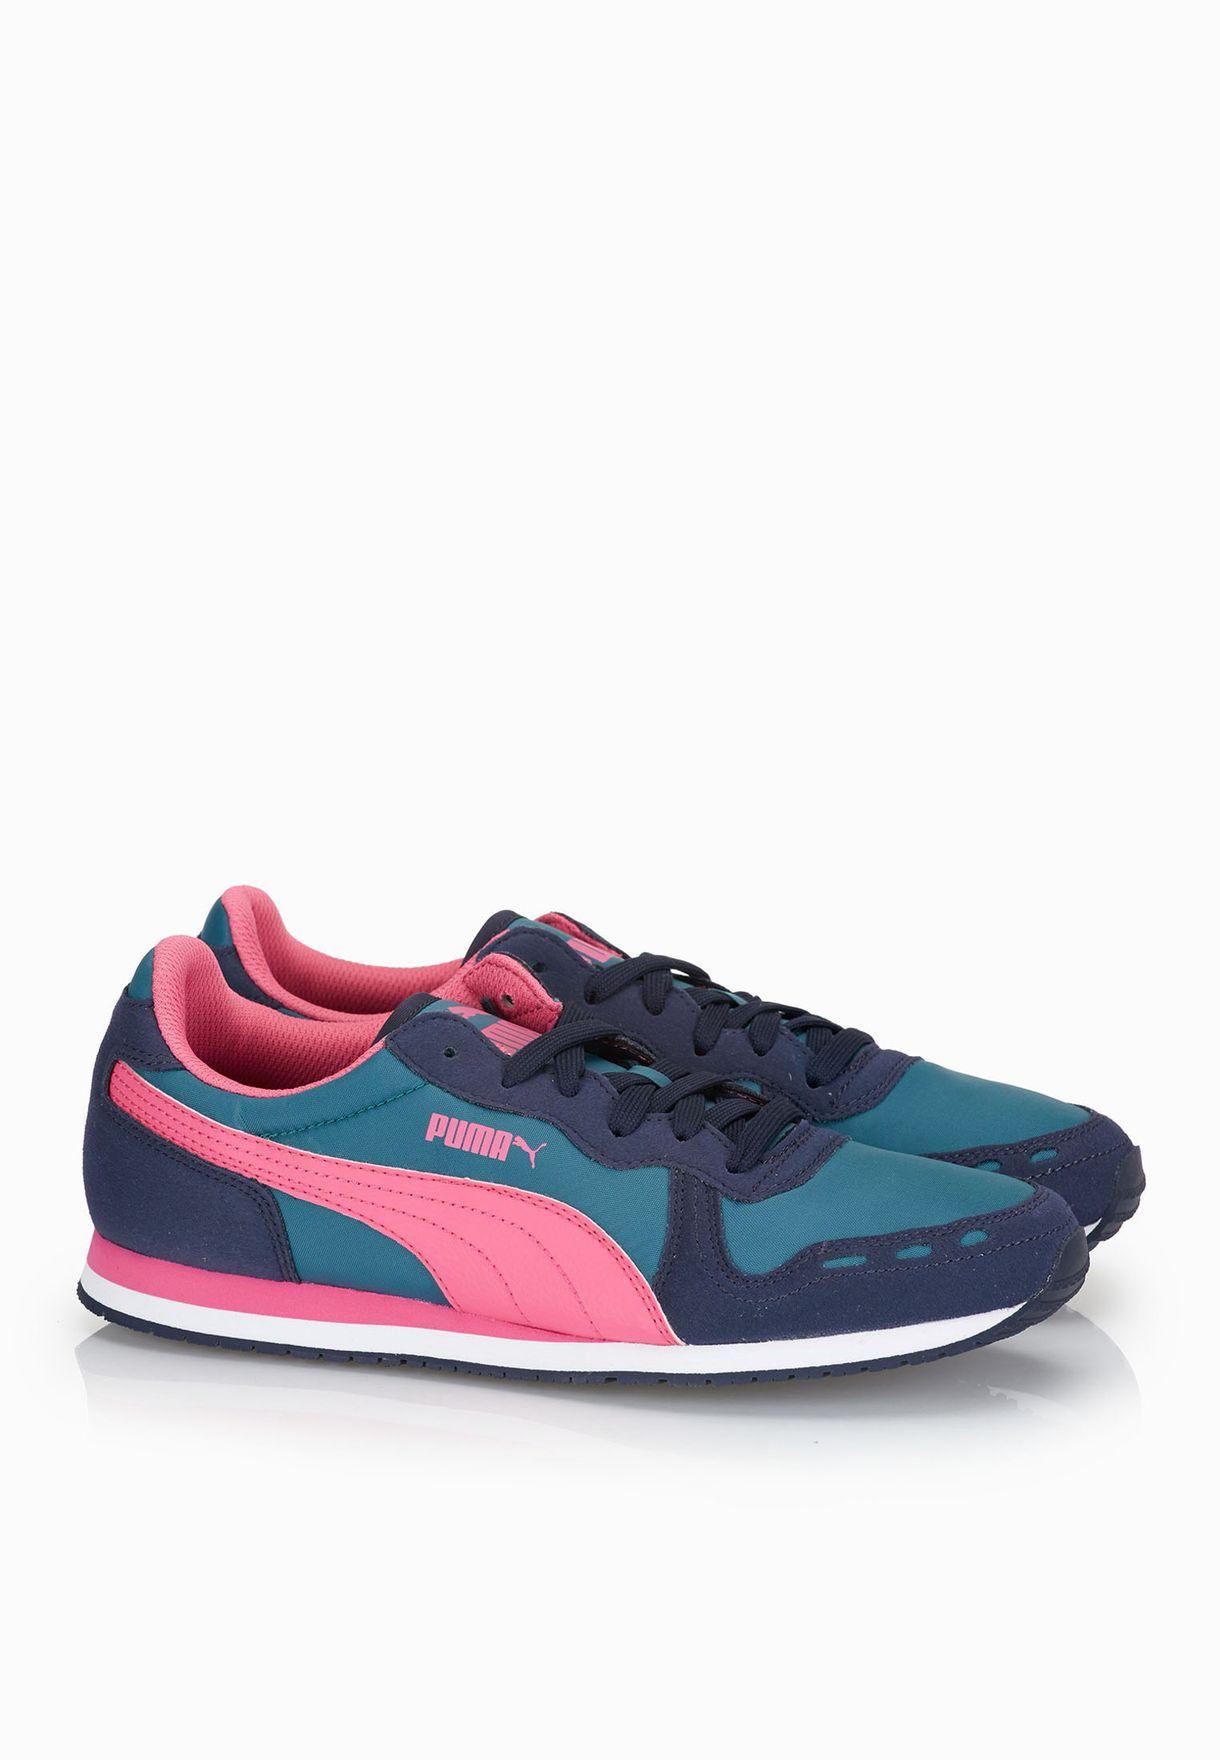 421e836e7cb Shop PUMA multicolor Cabana Racer Fun Sneakers 35839709 for Women in  Bahrain - PU020SH83HFW